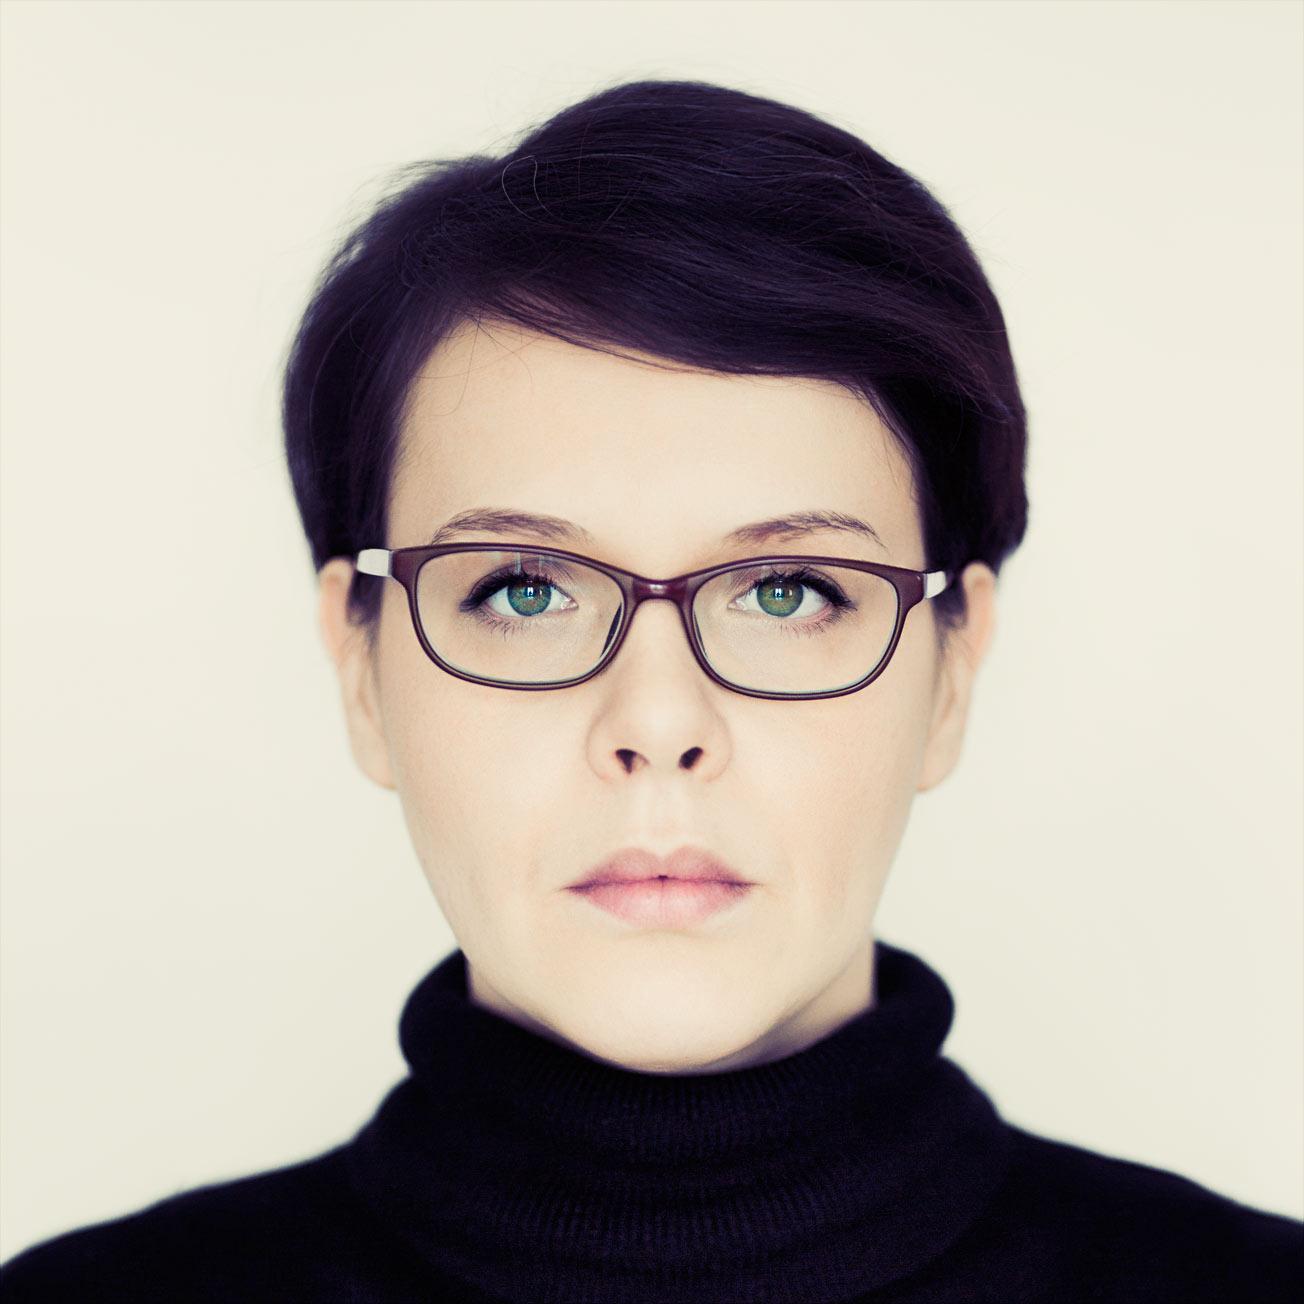 Jelena Tober